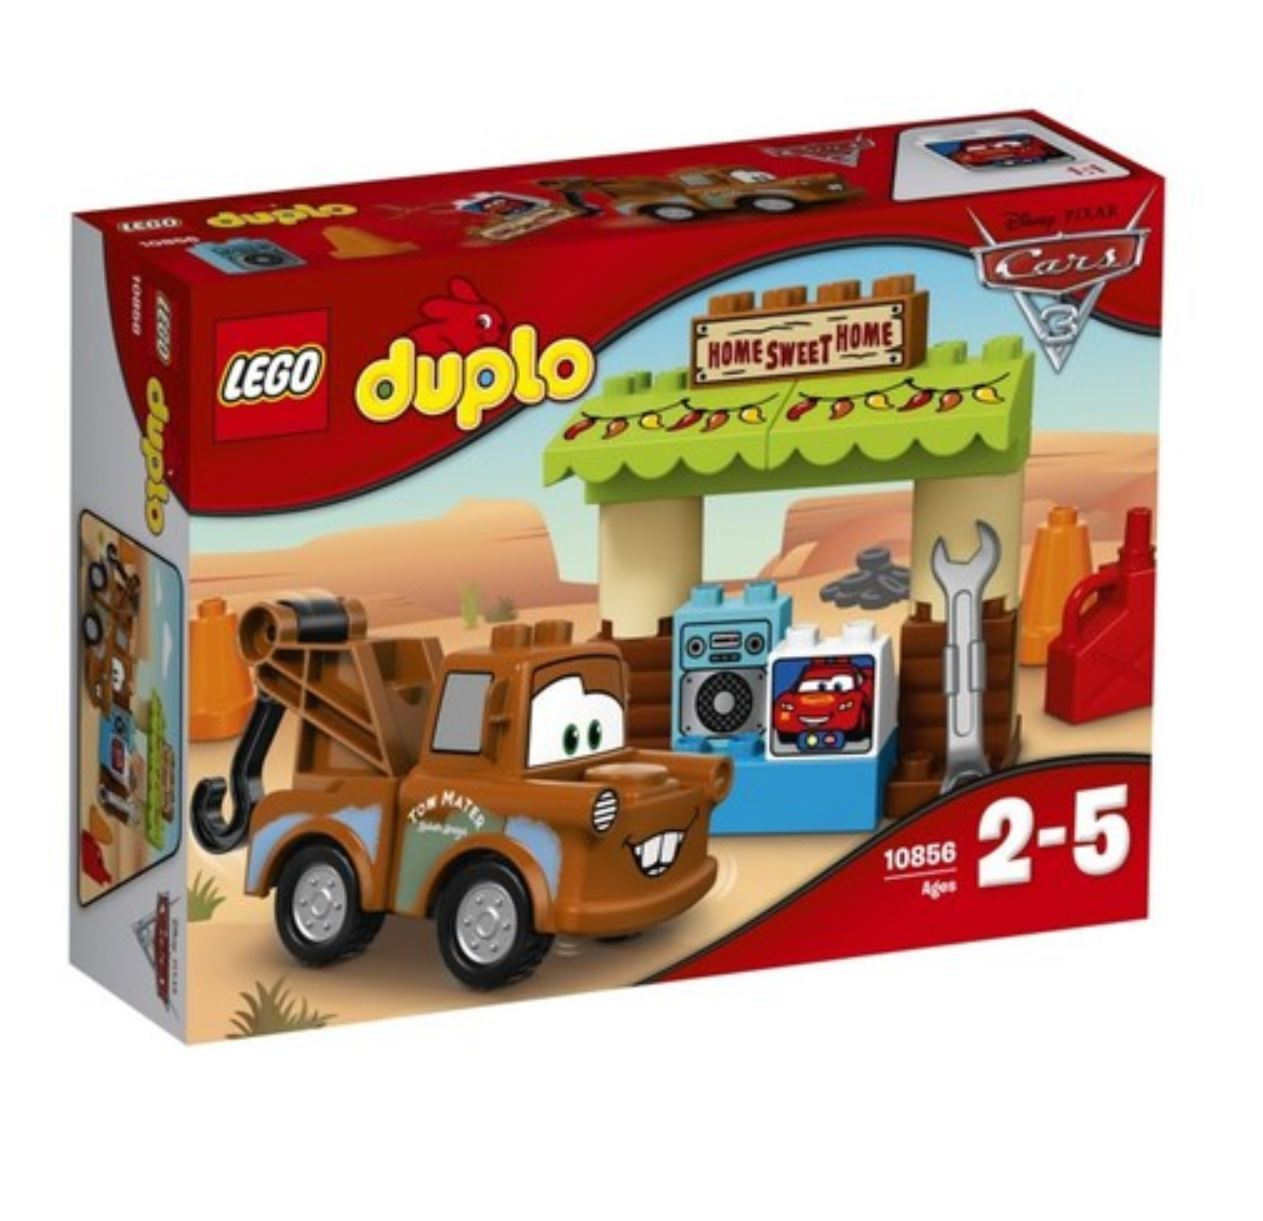 [LEGO] duplo 10856 Kreativt spela Mater 65533;65533; s Shed 2017 Version fri Shipping